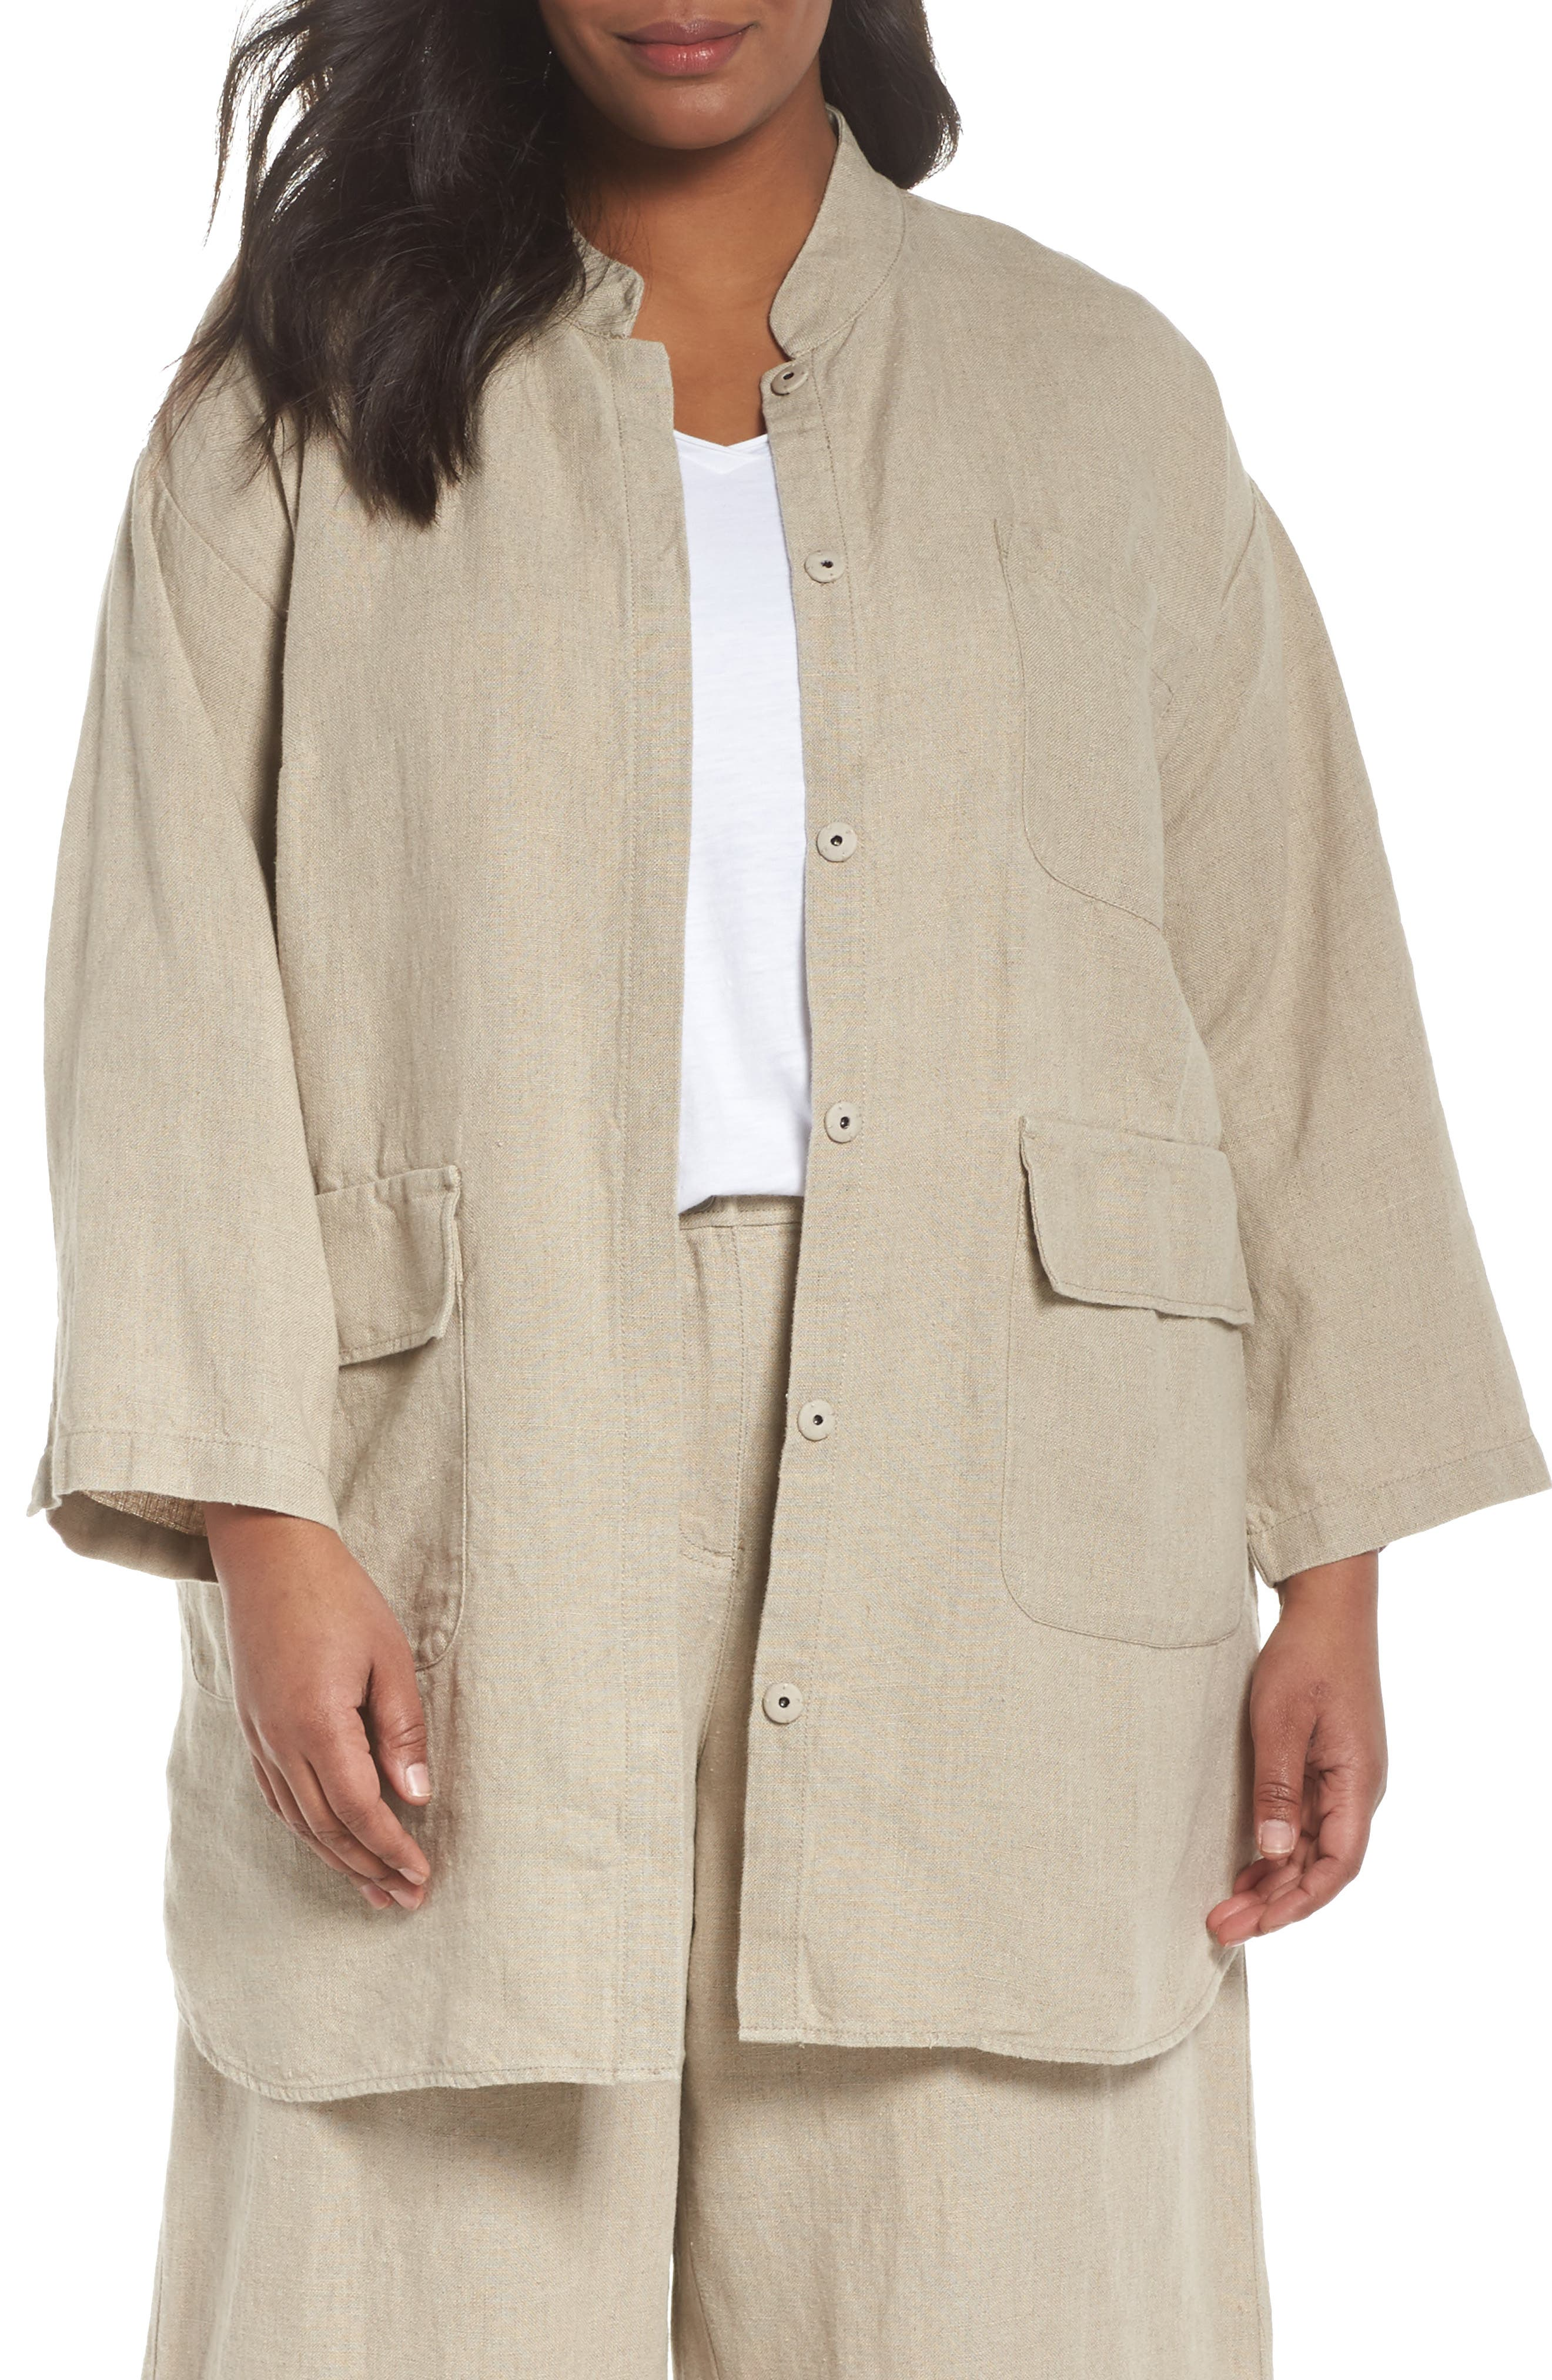 Eileen Fisher Organic Linen Jacket (Plus Size)